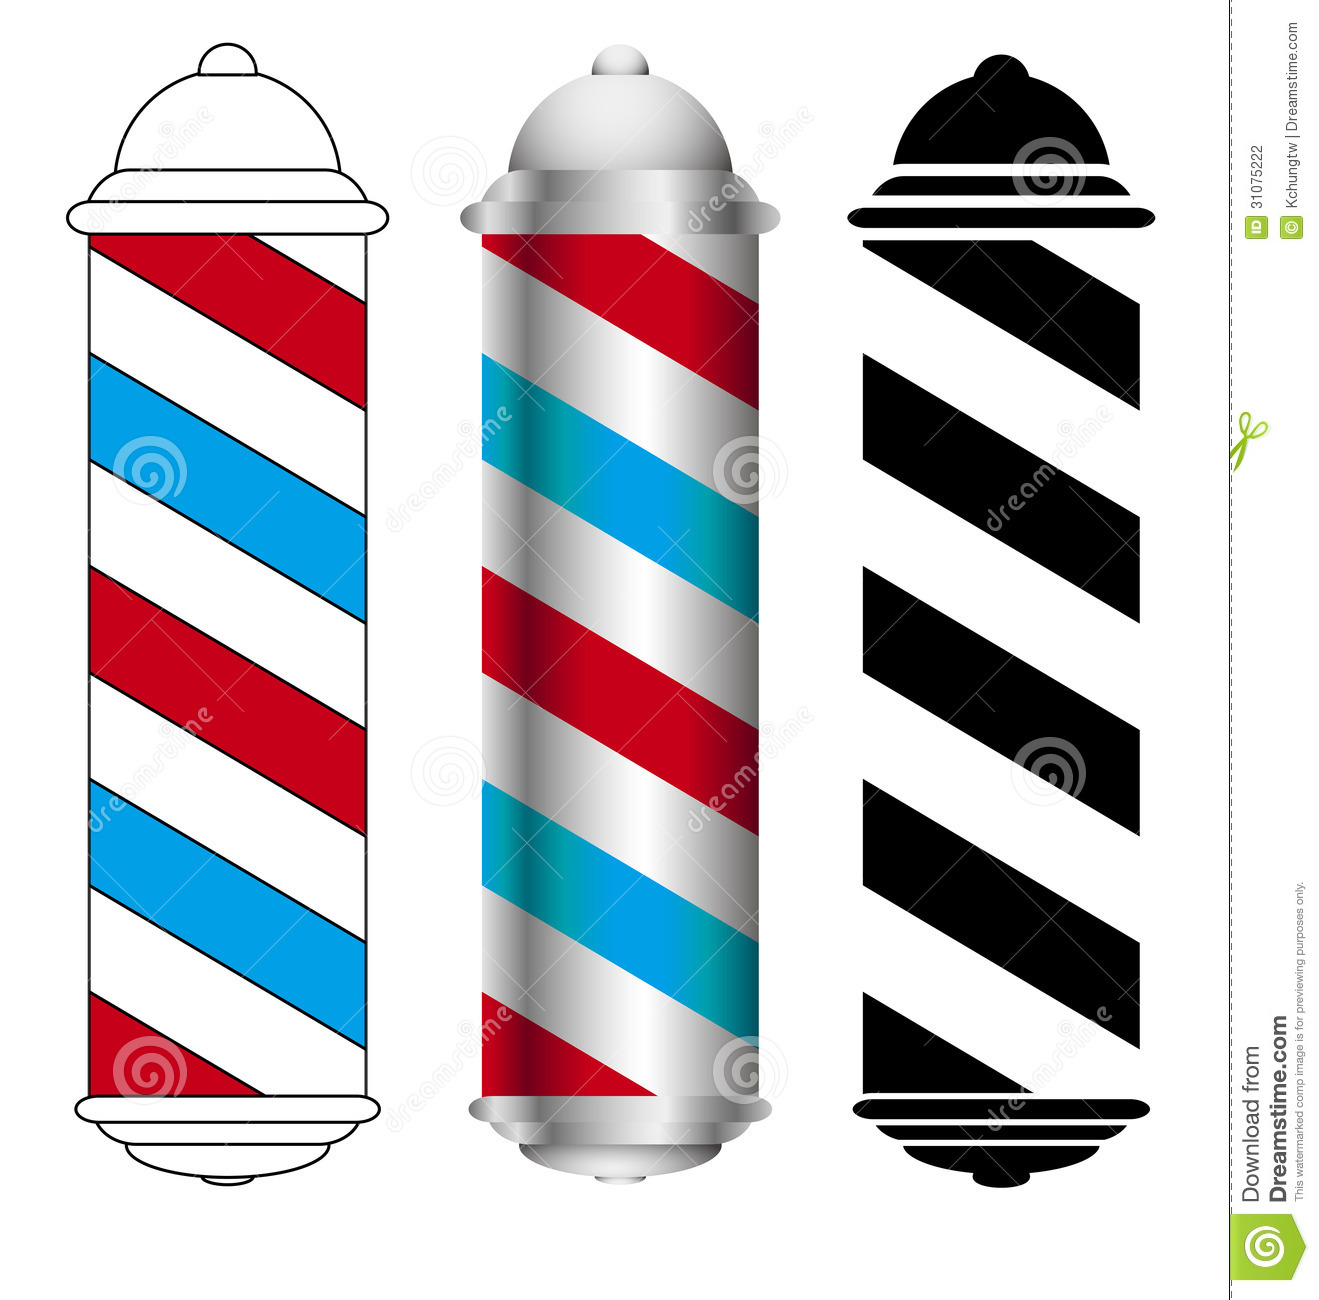 Barber Shop Clip Art Barber Shop Pole Stock Photography Image